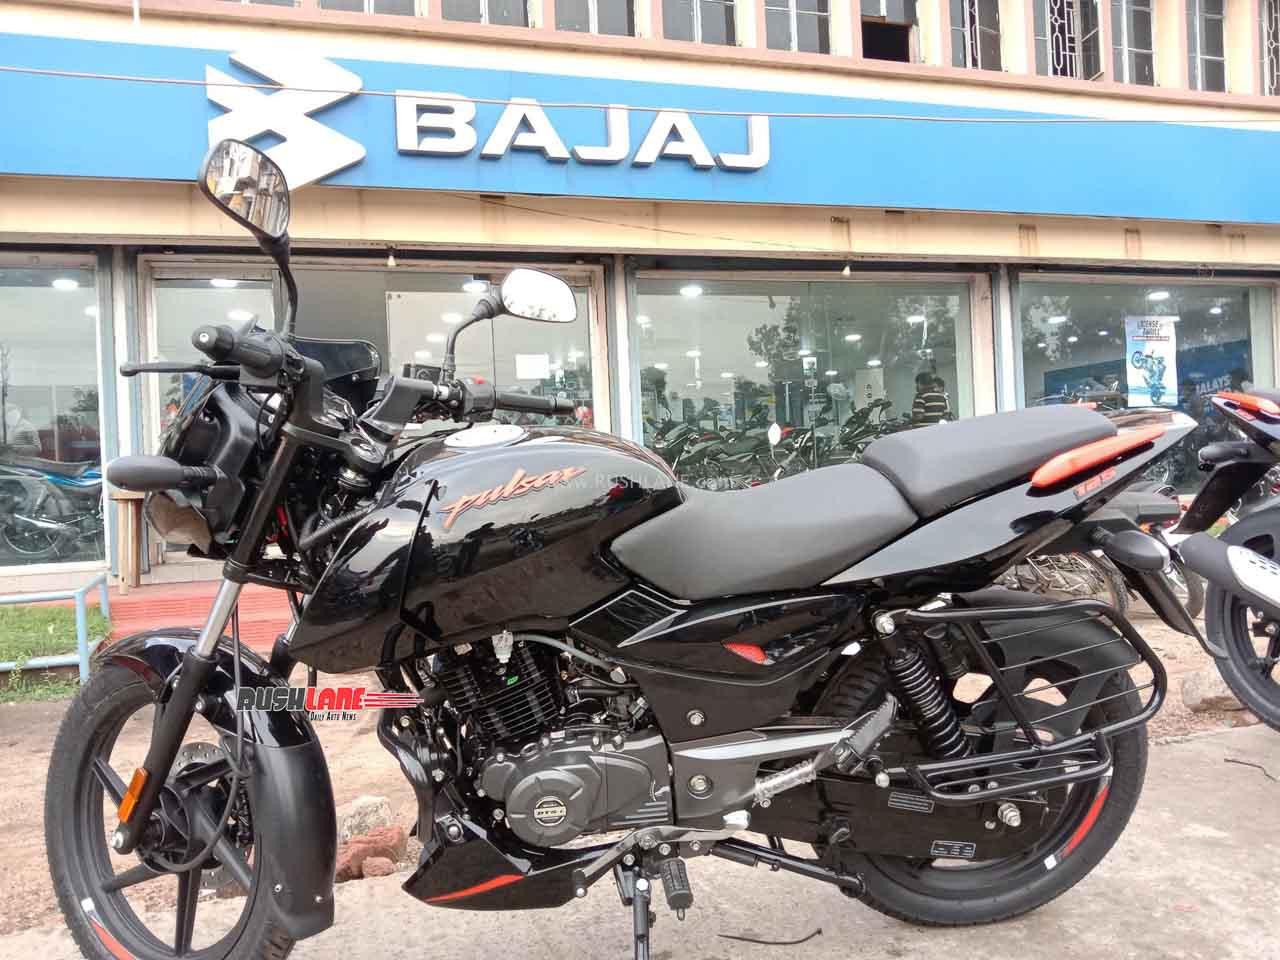 Bajaj Pulsar BS6 sales June 2020